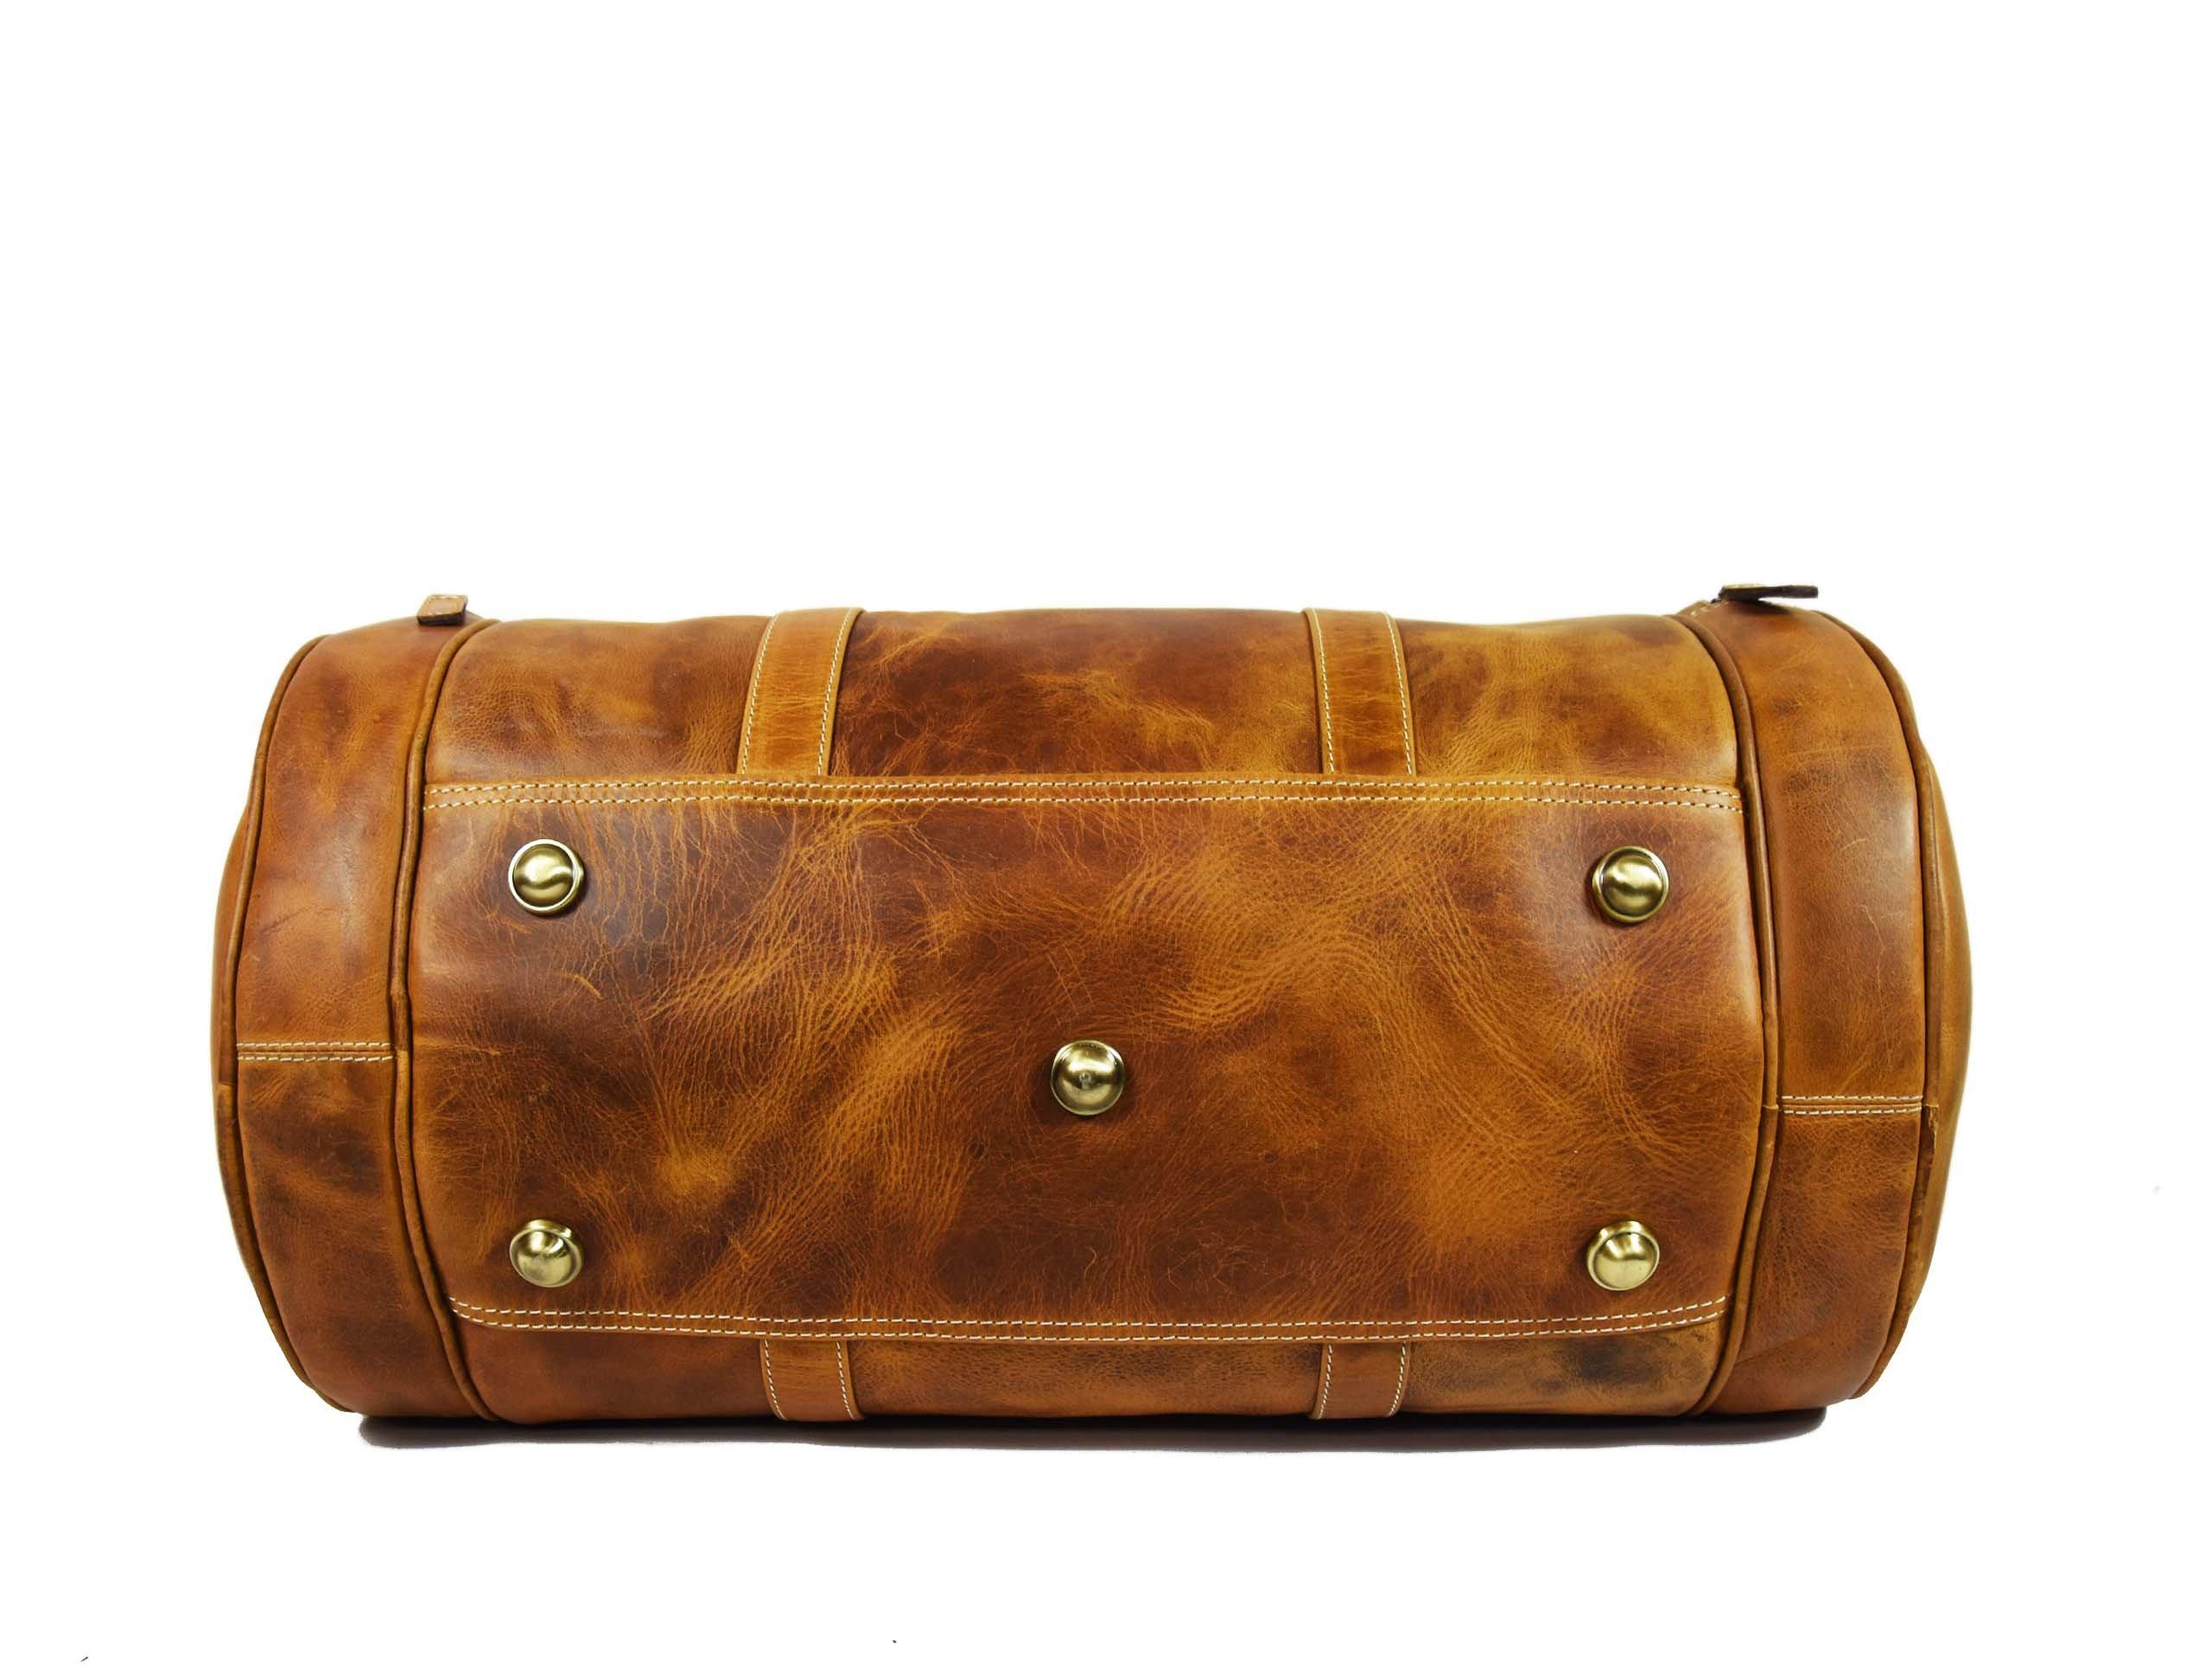 Travel Duffel Overnight Barrel Weekend Leather Bag by Aaron Leather (Brown) by Aaron Leather (Image #5)